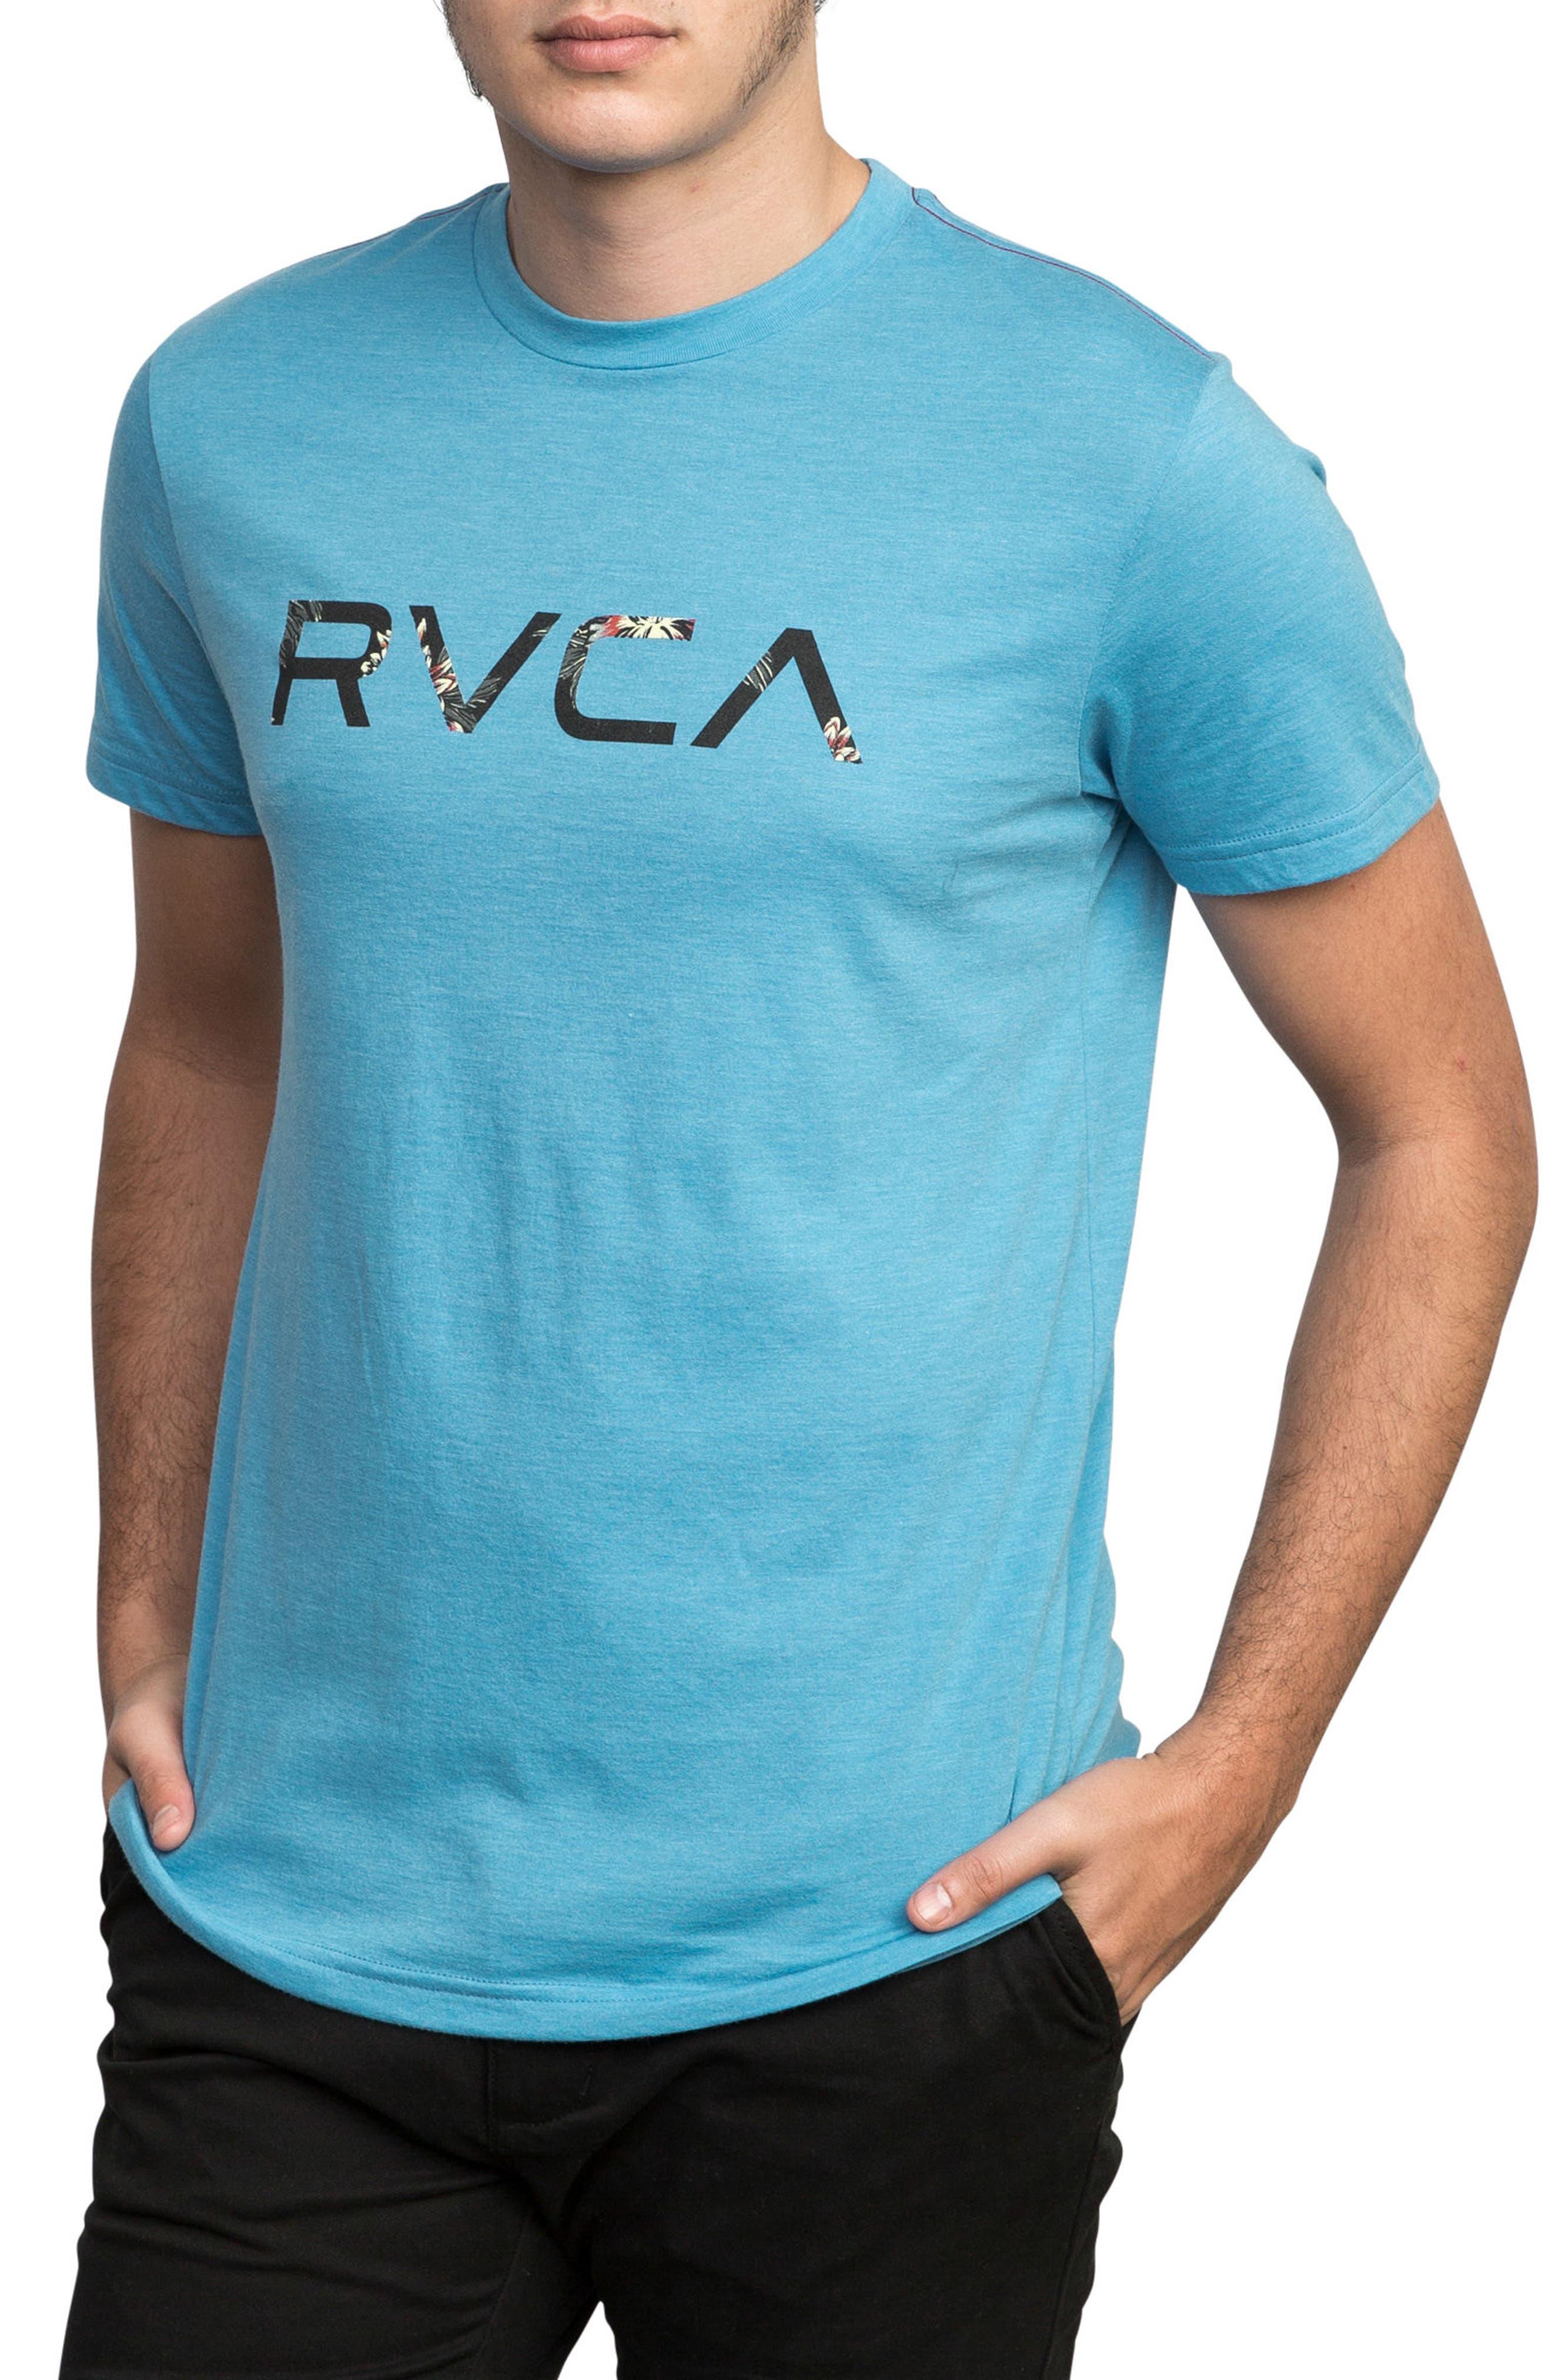 McFloral T-Shirt,                             Alternate thumbnail 3, color,                             Lagoon